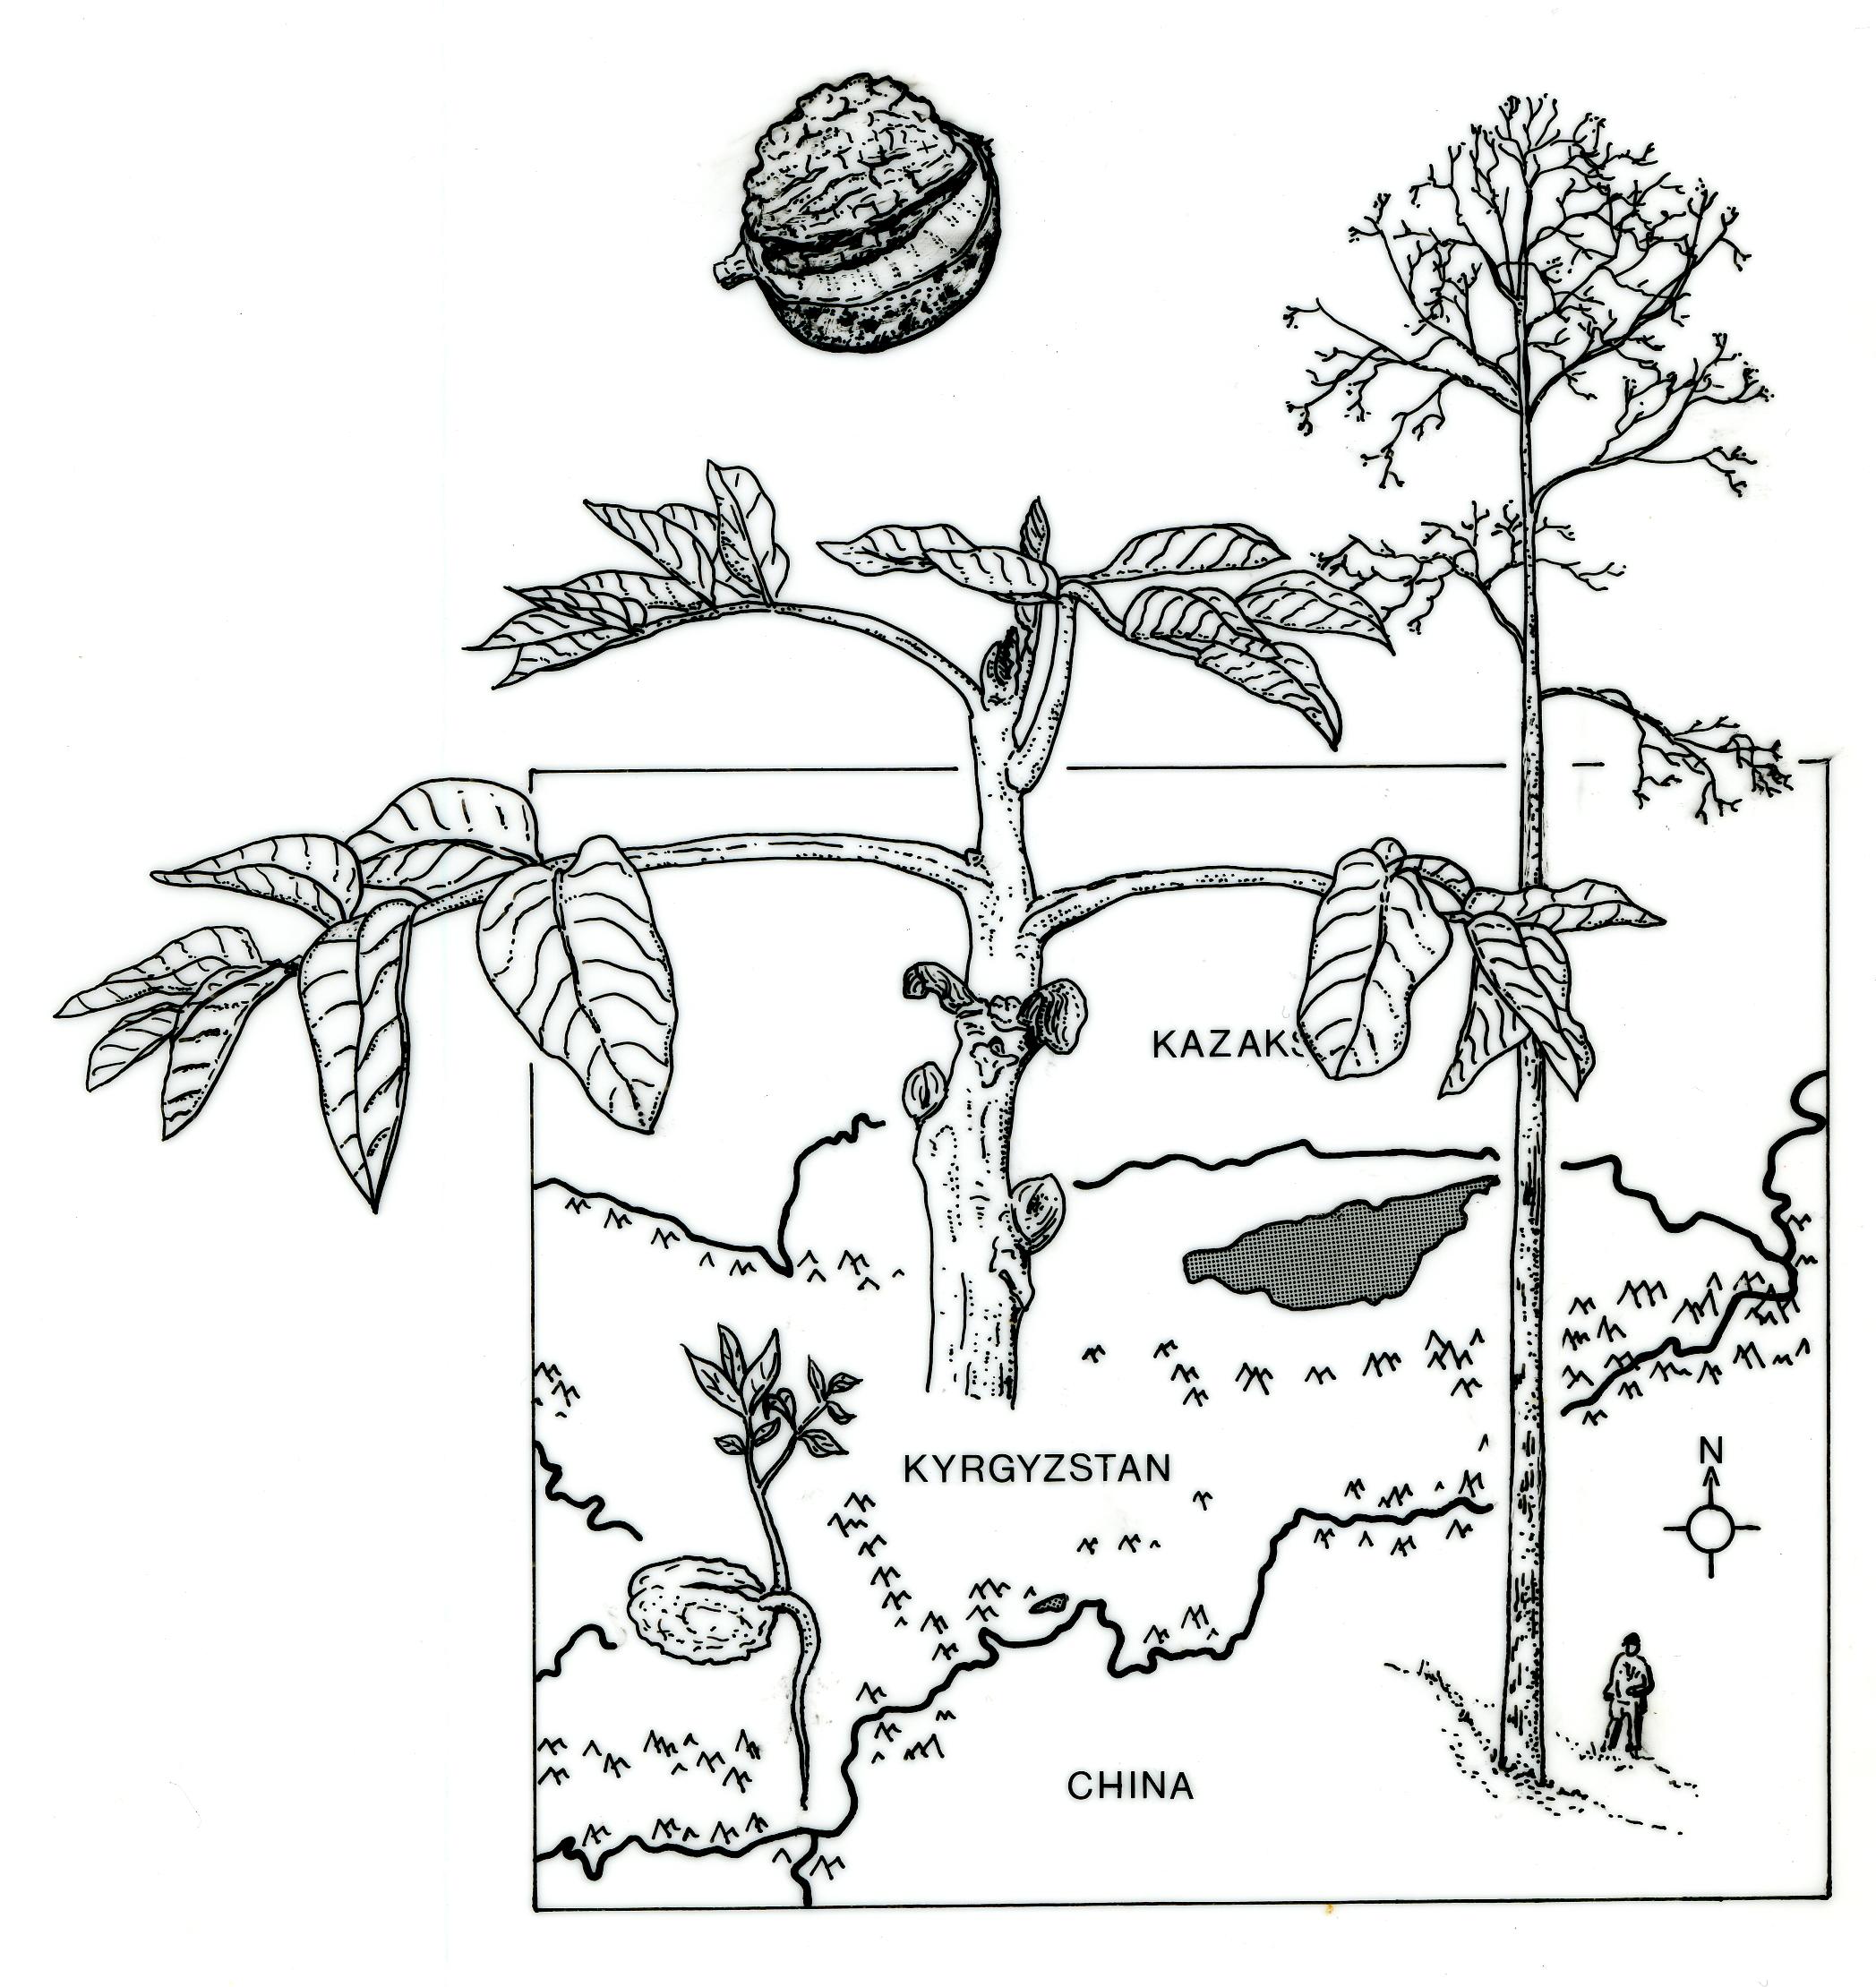 Kyrgyzstan walnut expedition